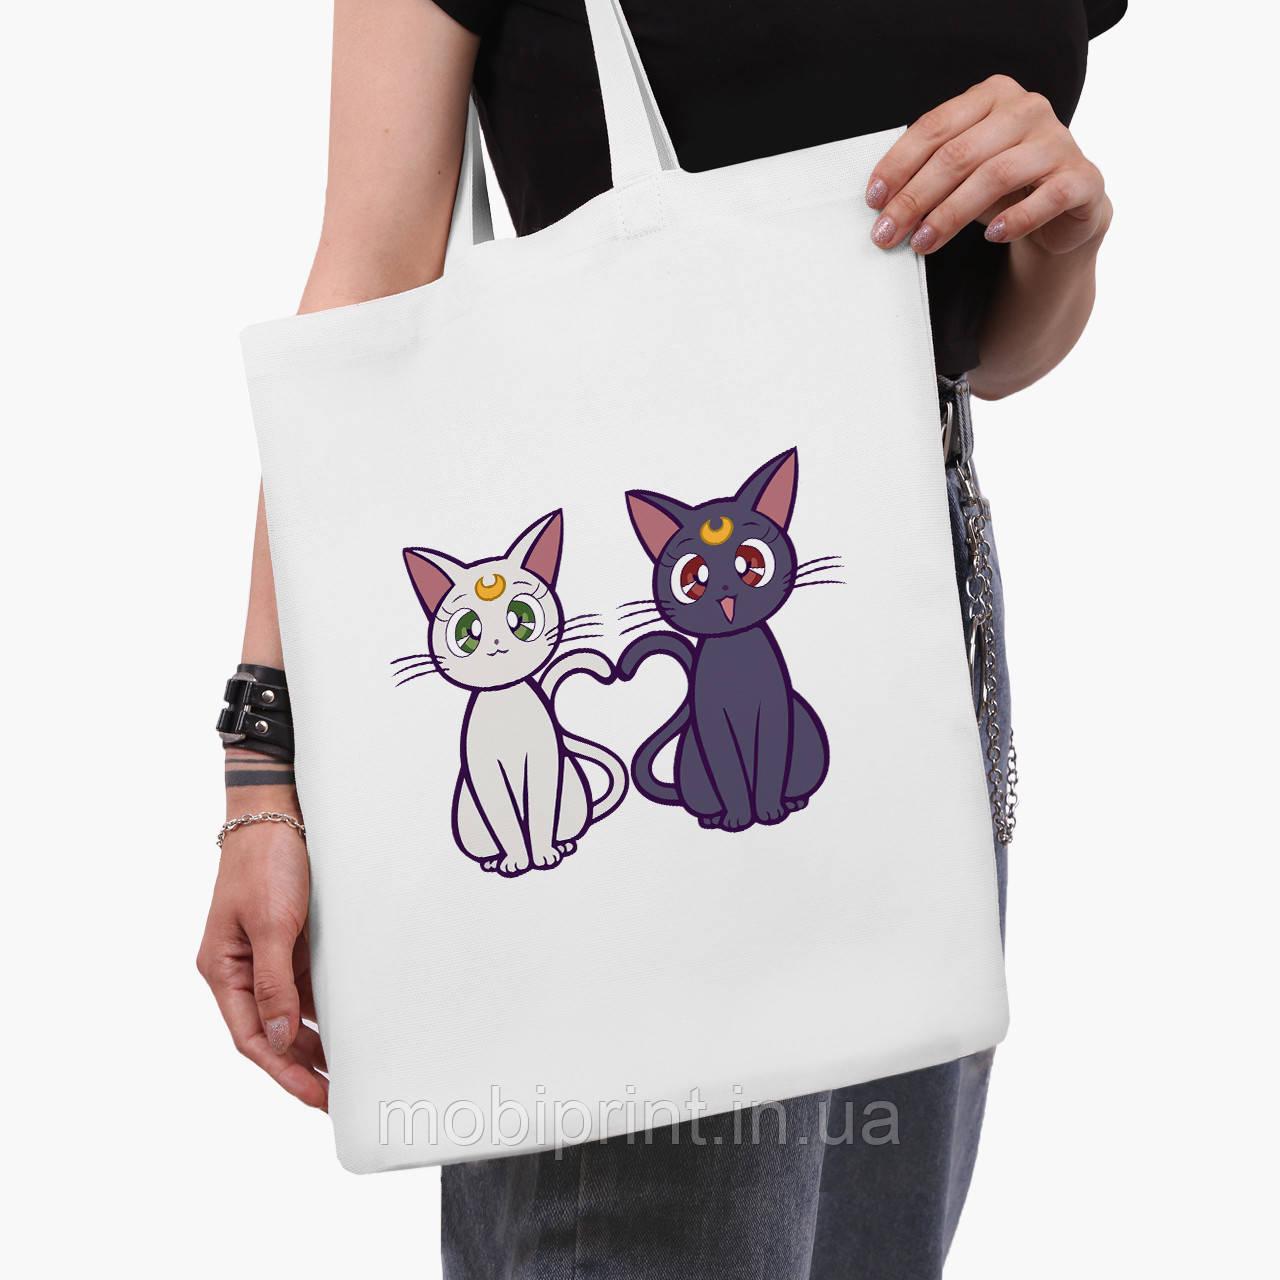 Эко сумка шоппер белая Луна Кошки Сейлор Мун (anime Sailor Moon Cats) (9227-2849-3)  41*35 см